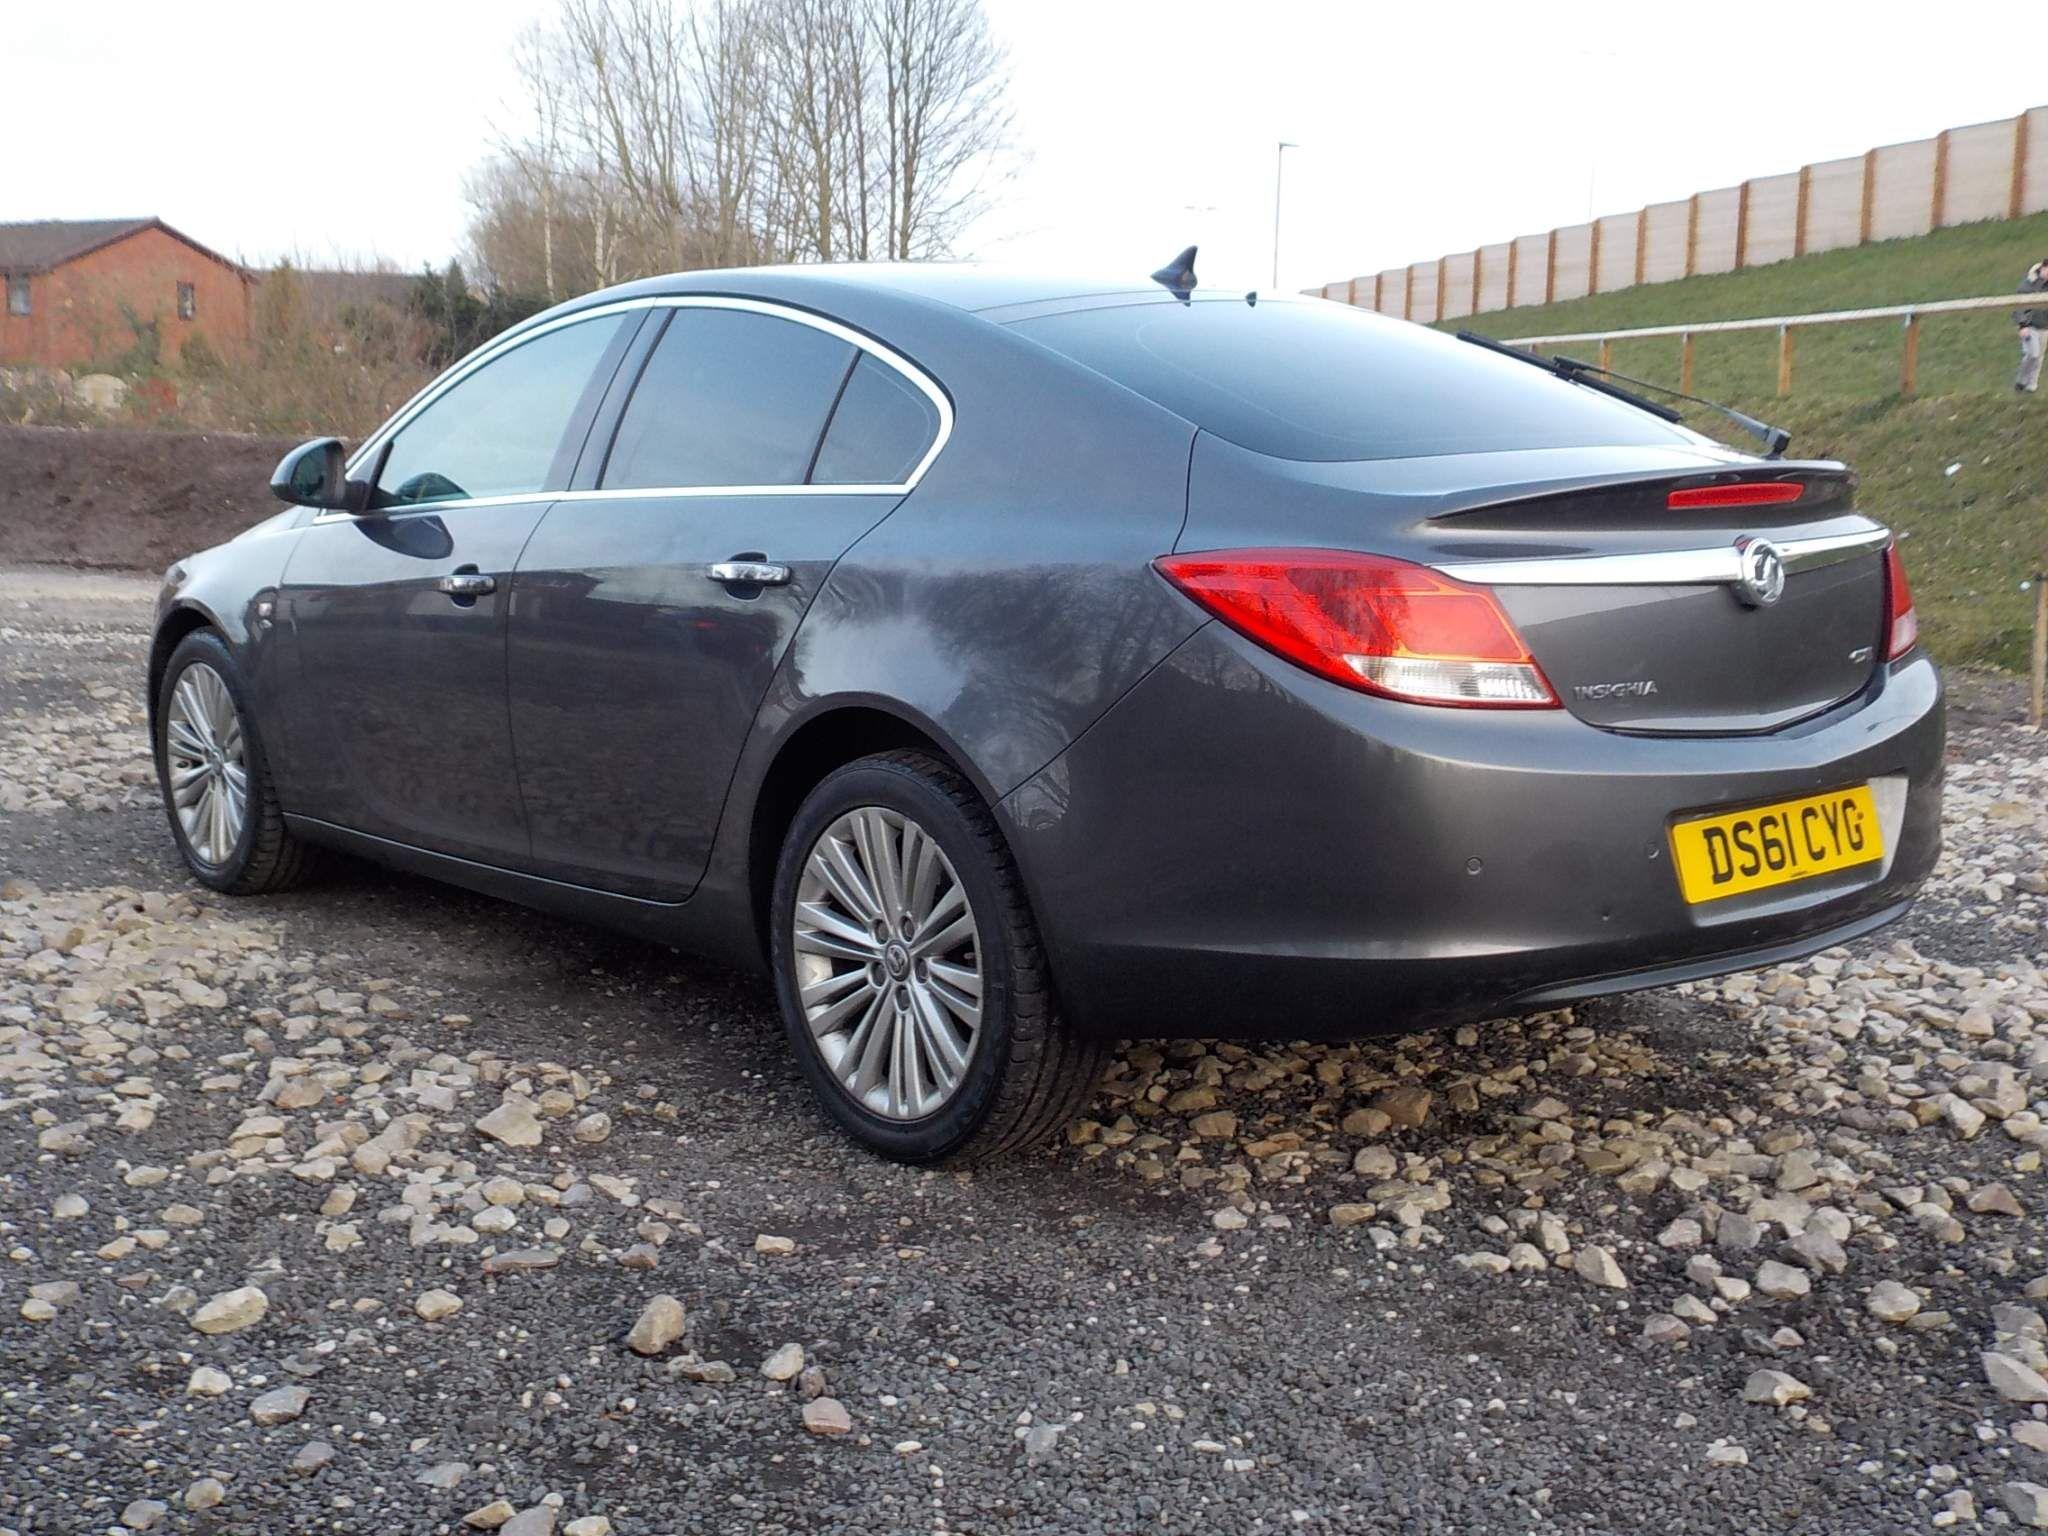 Vauxhall Insignia 2.0 CDTi 16v Elite 5dr